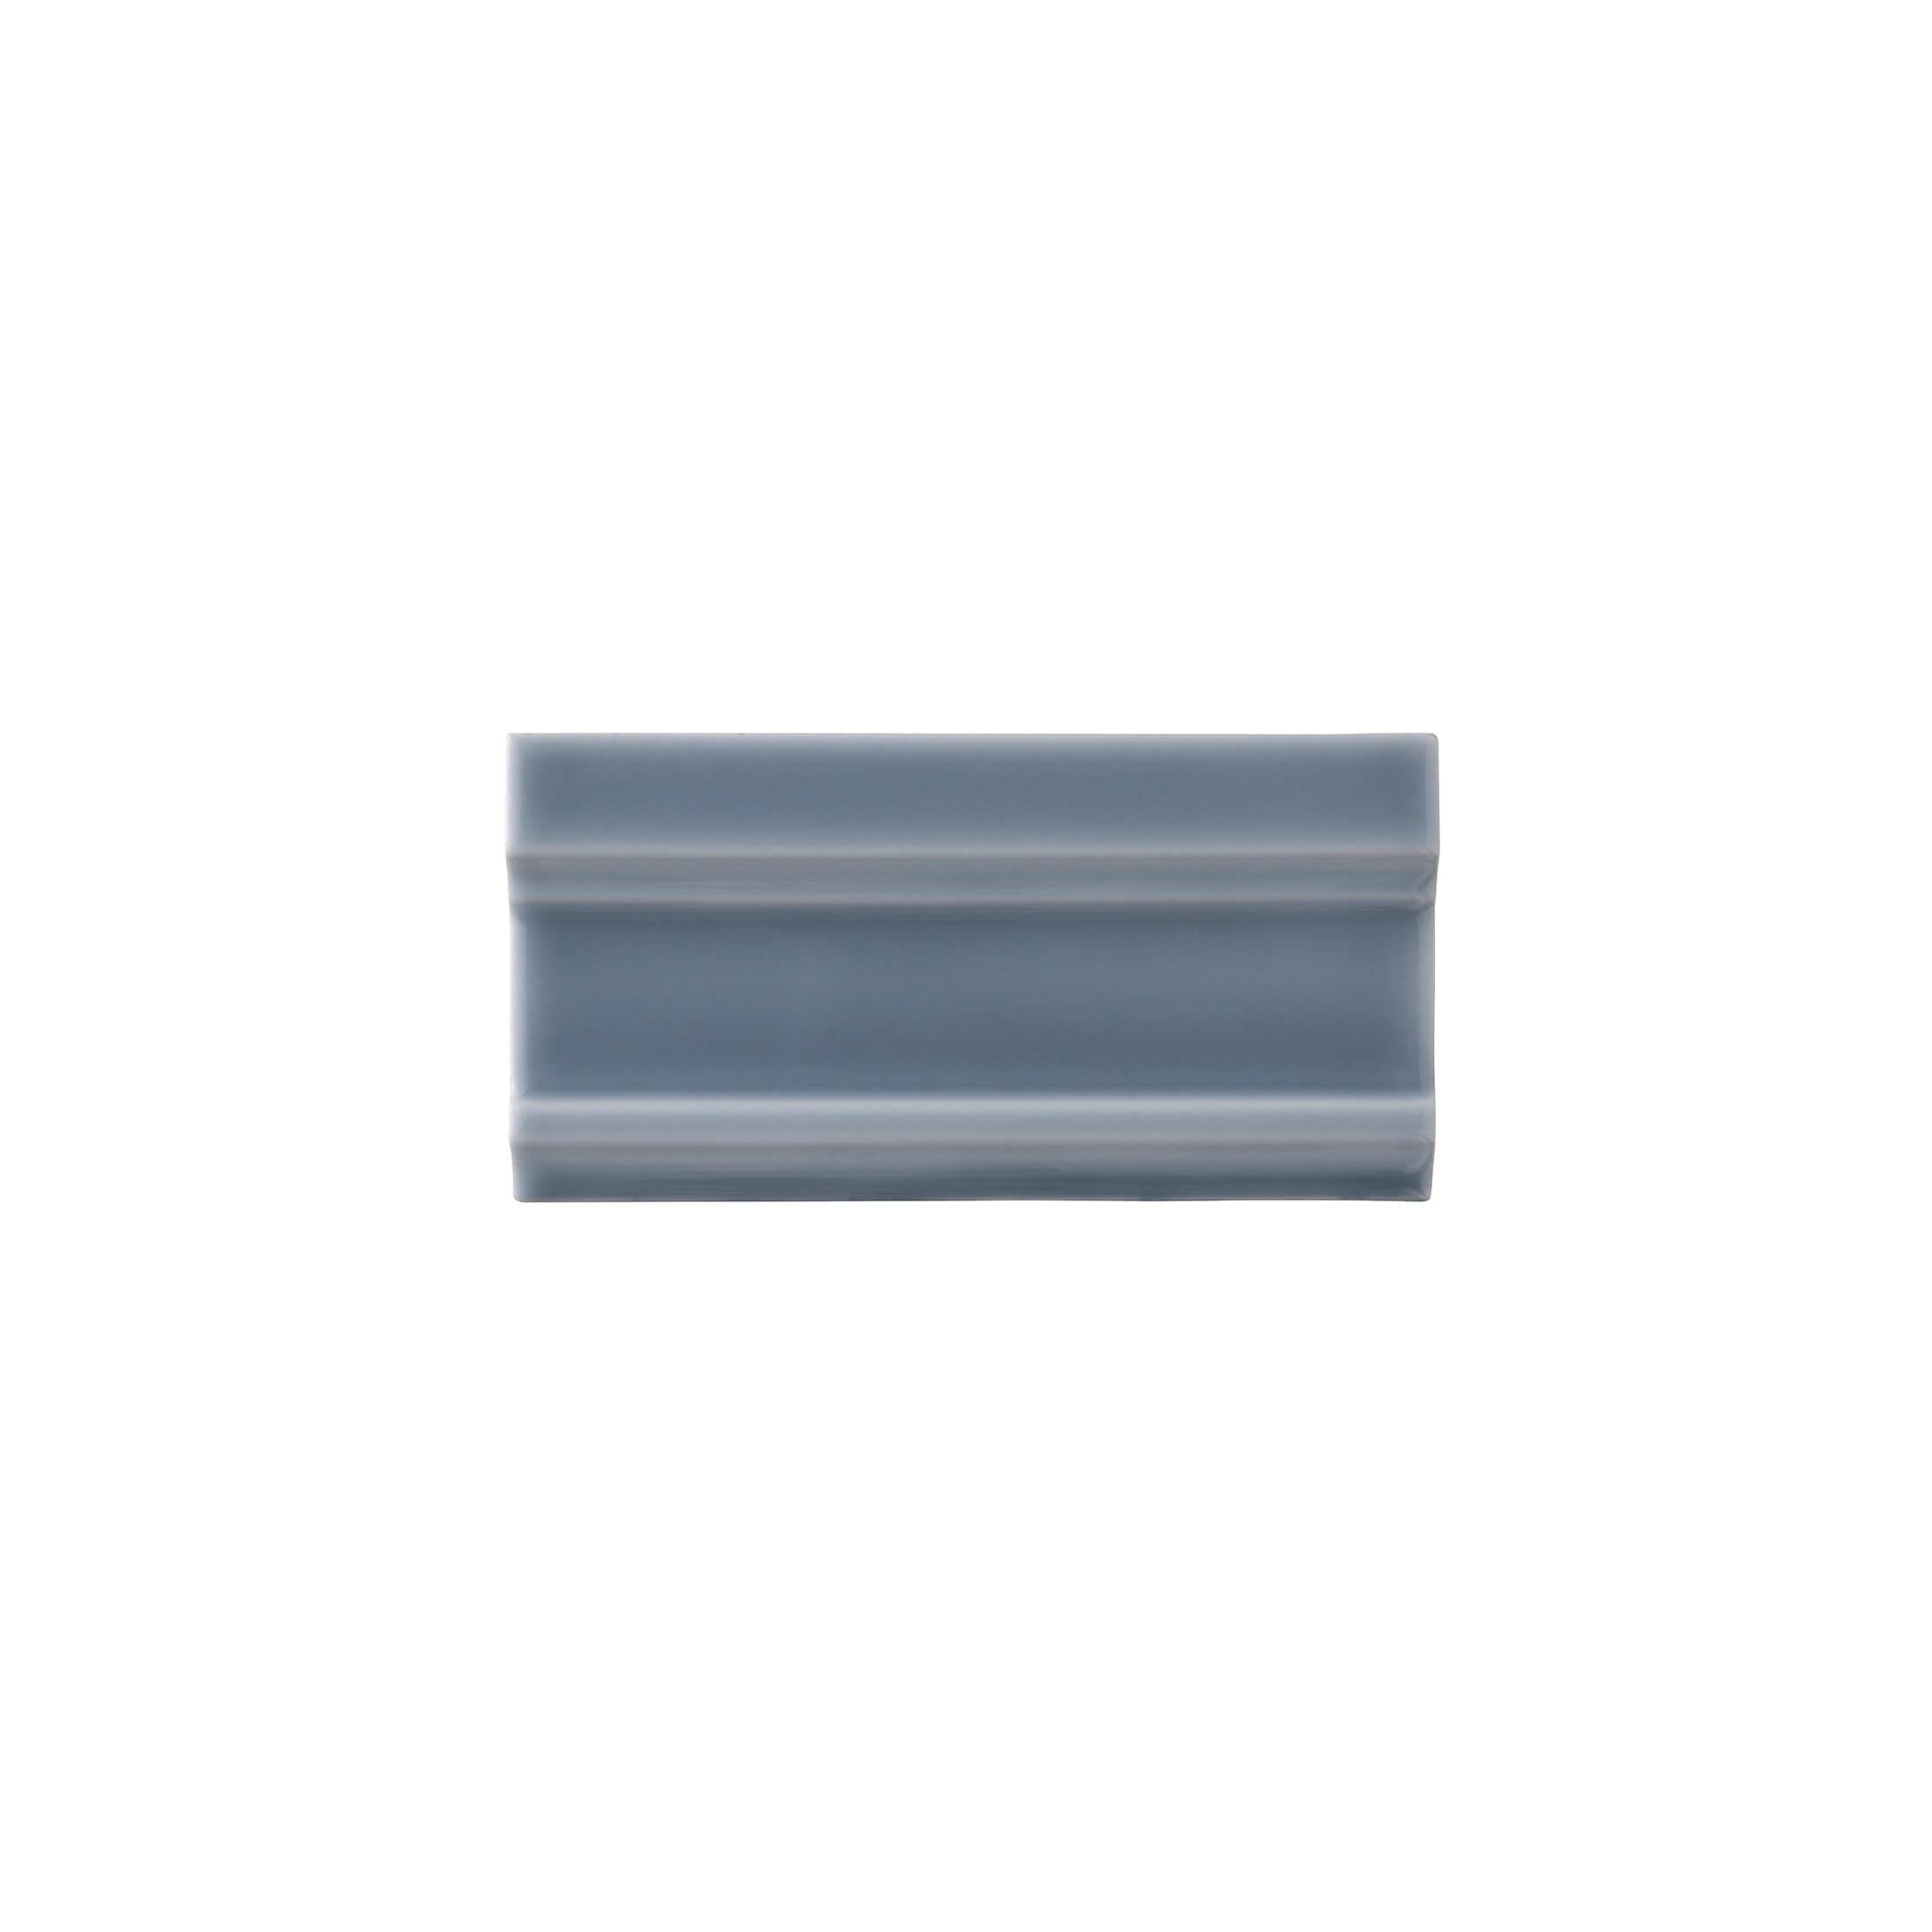 ADNE5603 - CORNISA CLASICA - 7.5 cm X 15 cm